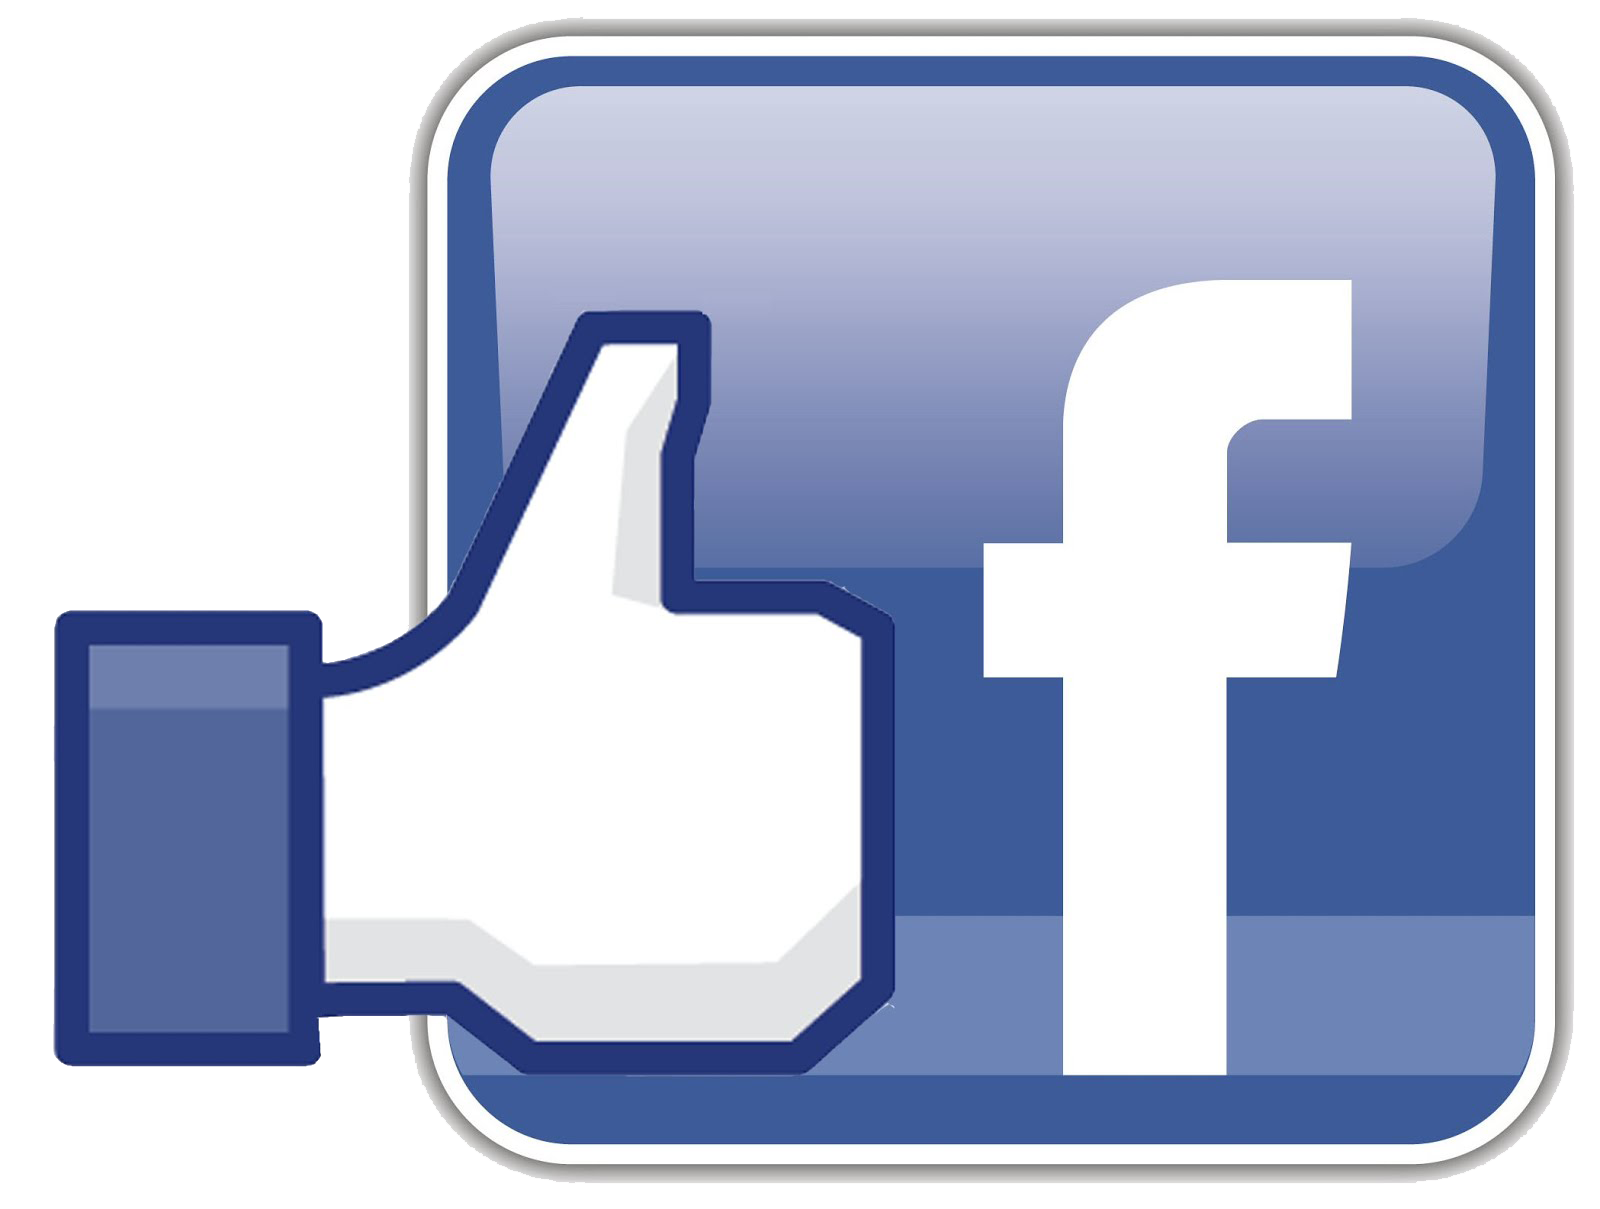 Facebook Logo Png 2 image #1